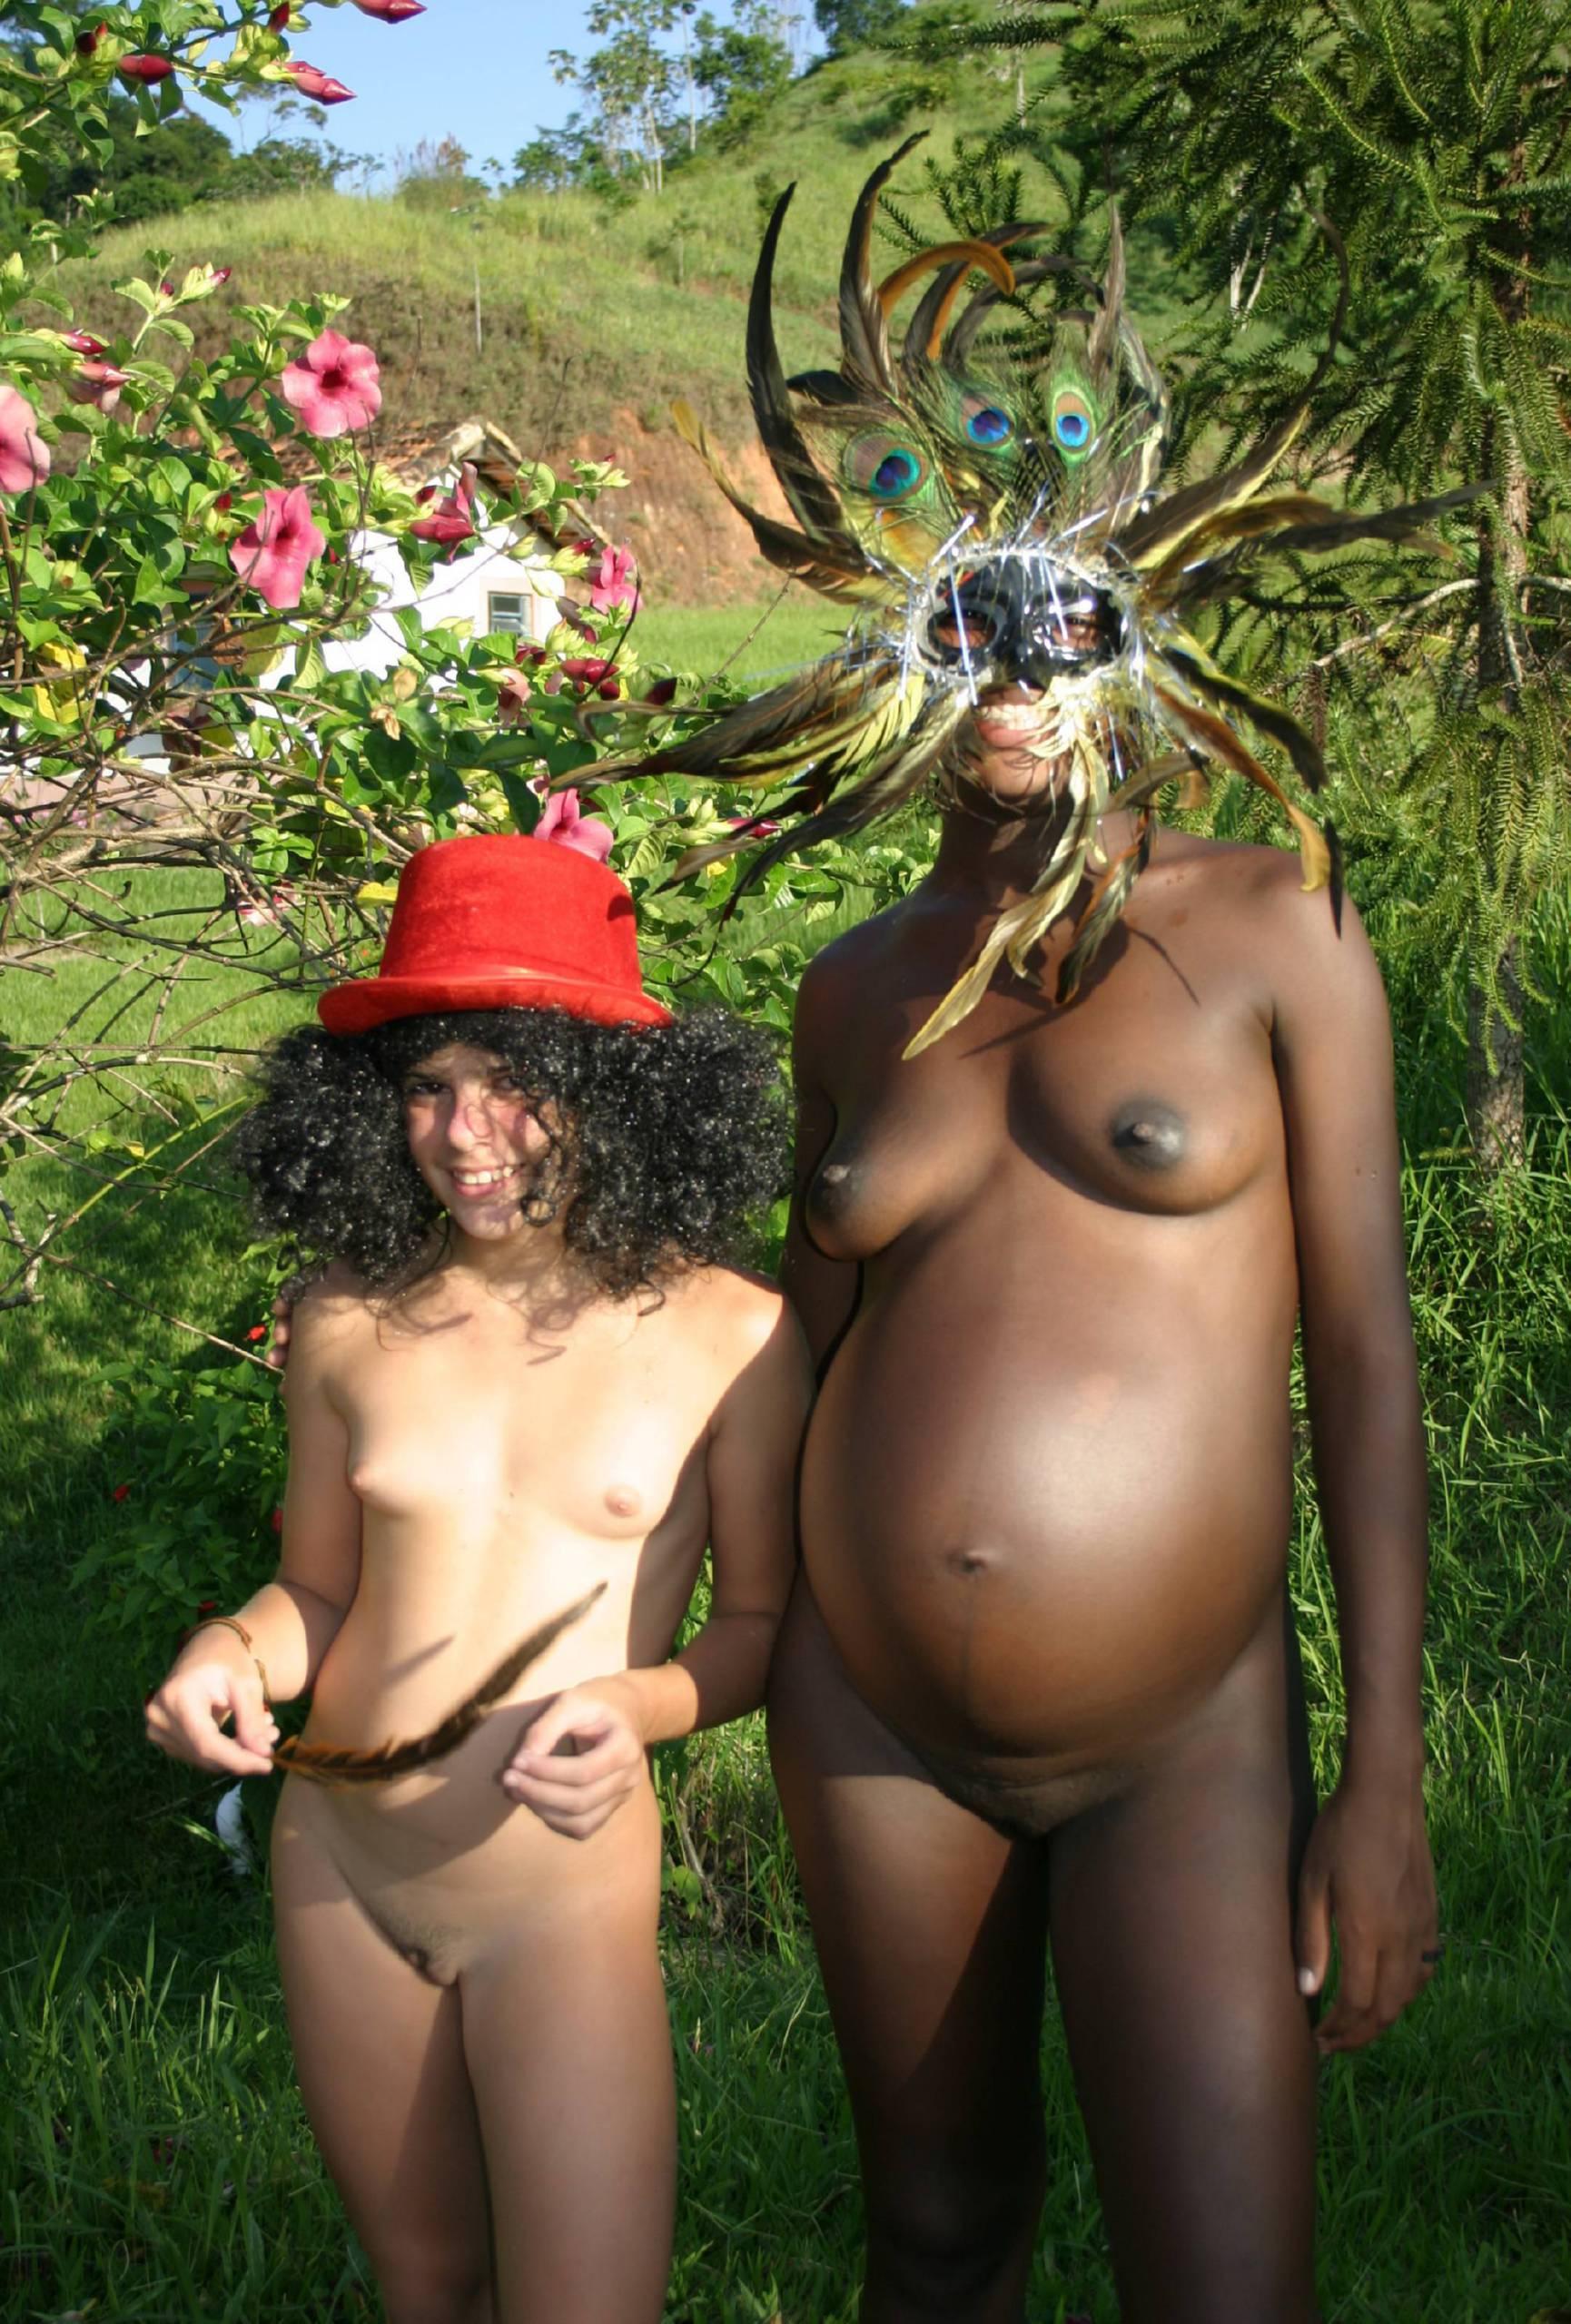 Nudist Photos Brazilian Duel Mask Shoot - 1